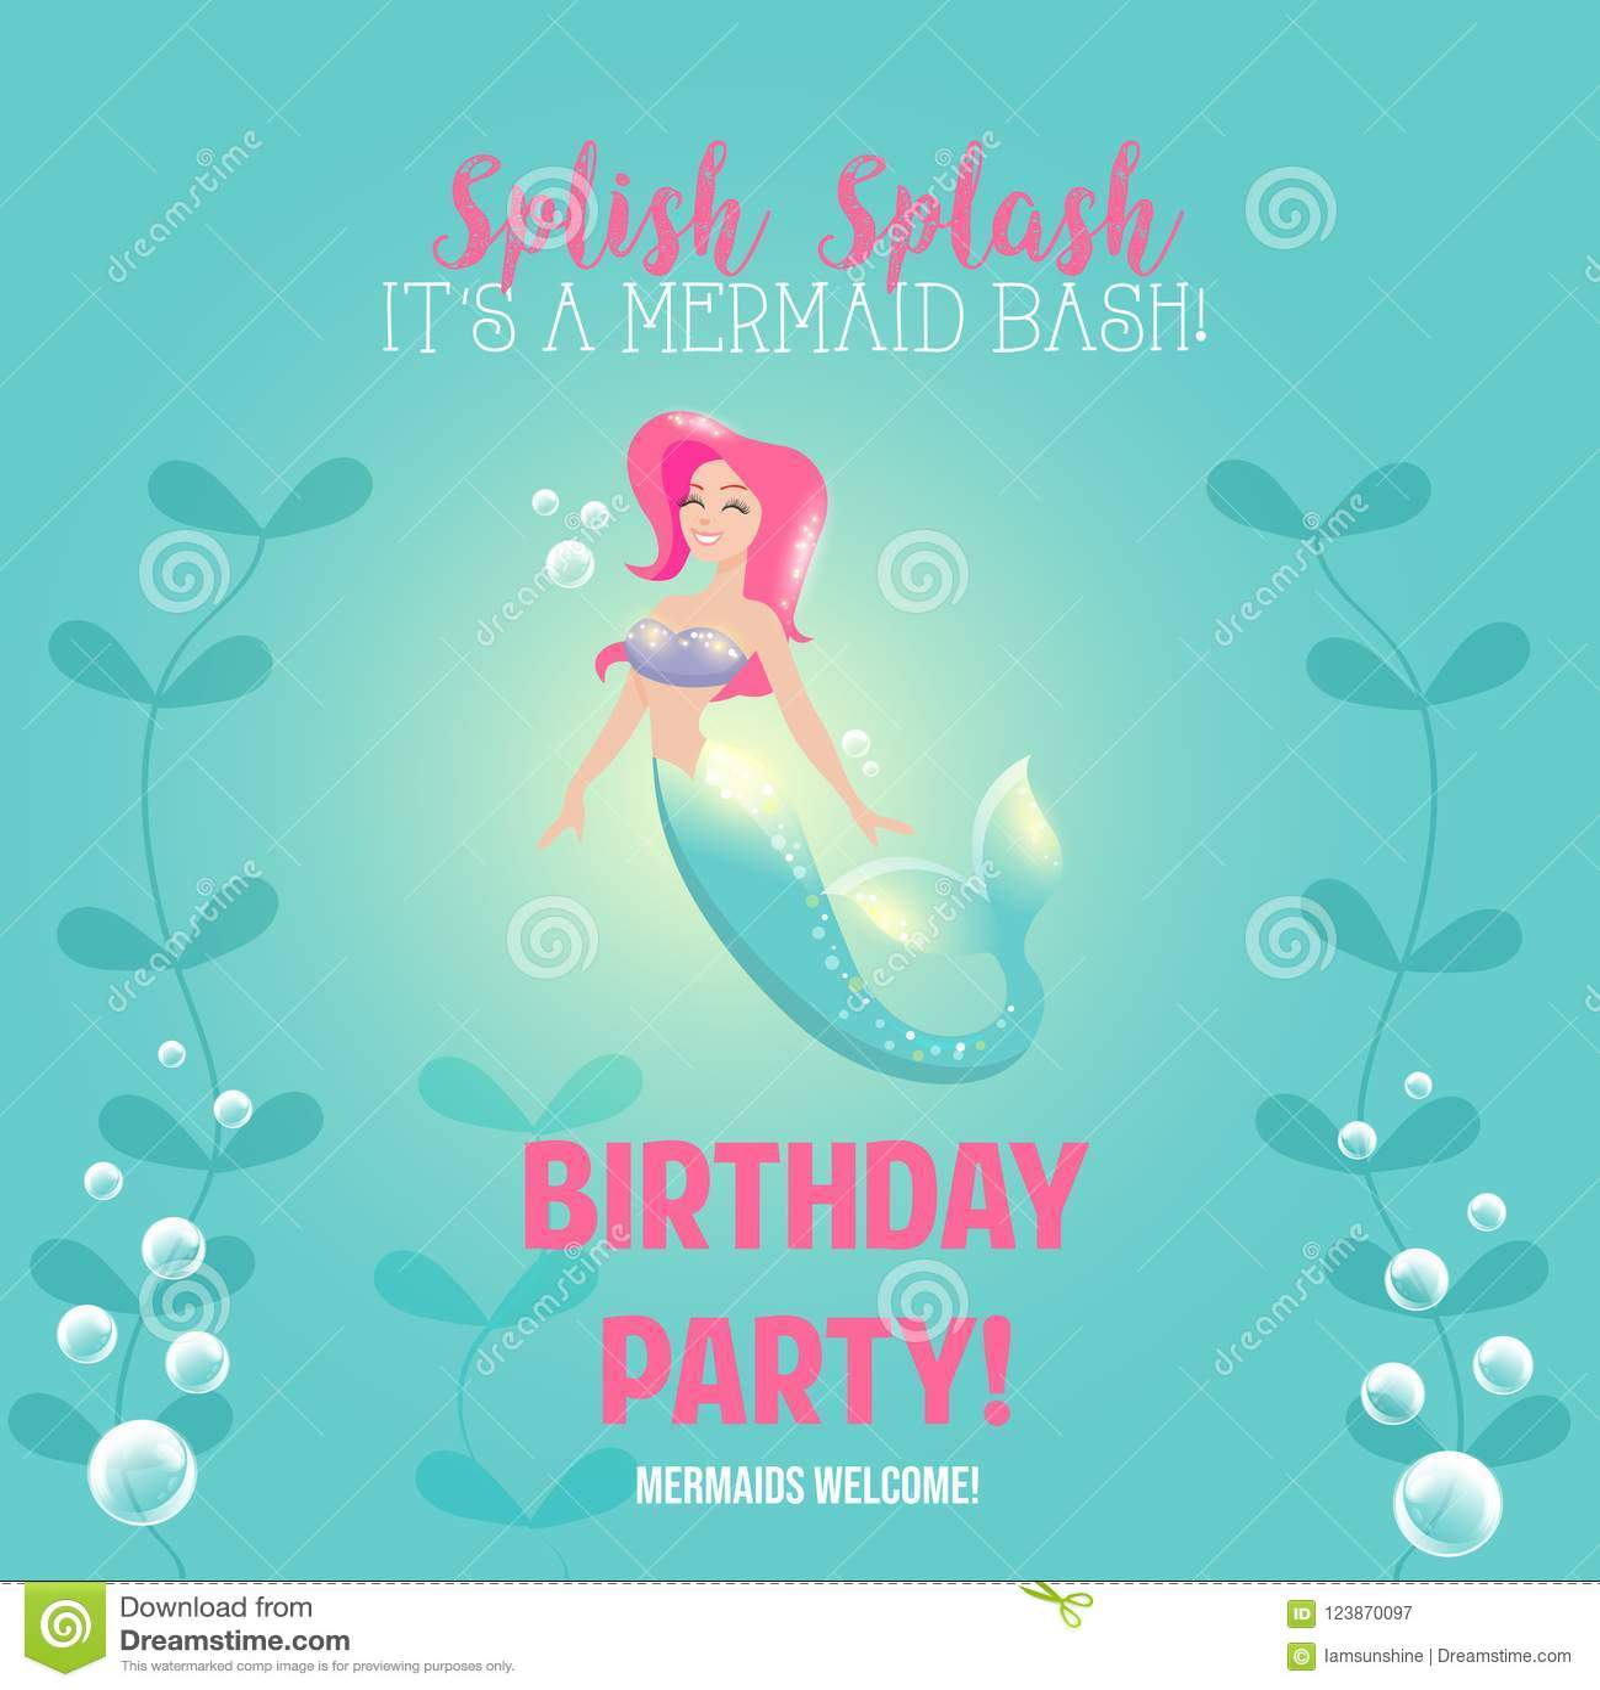 Mermaid Birthday Party Stock Vector Illustration Of Funny